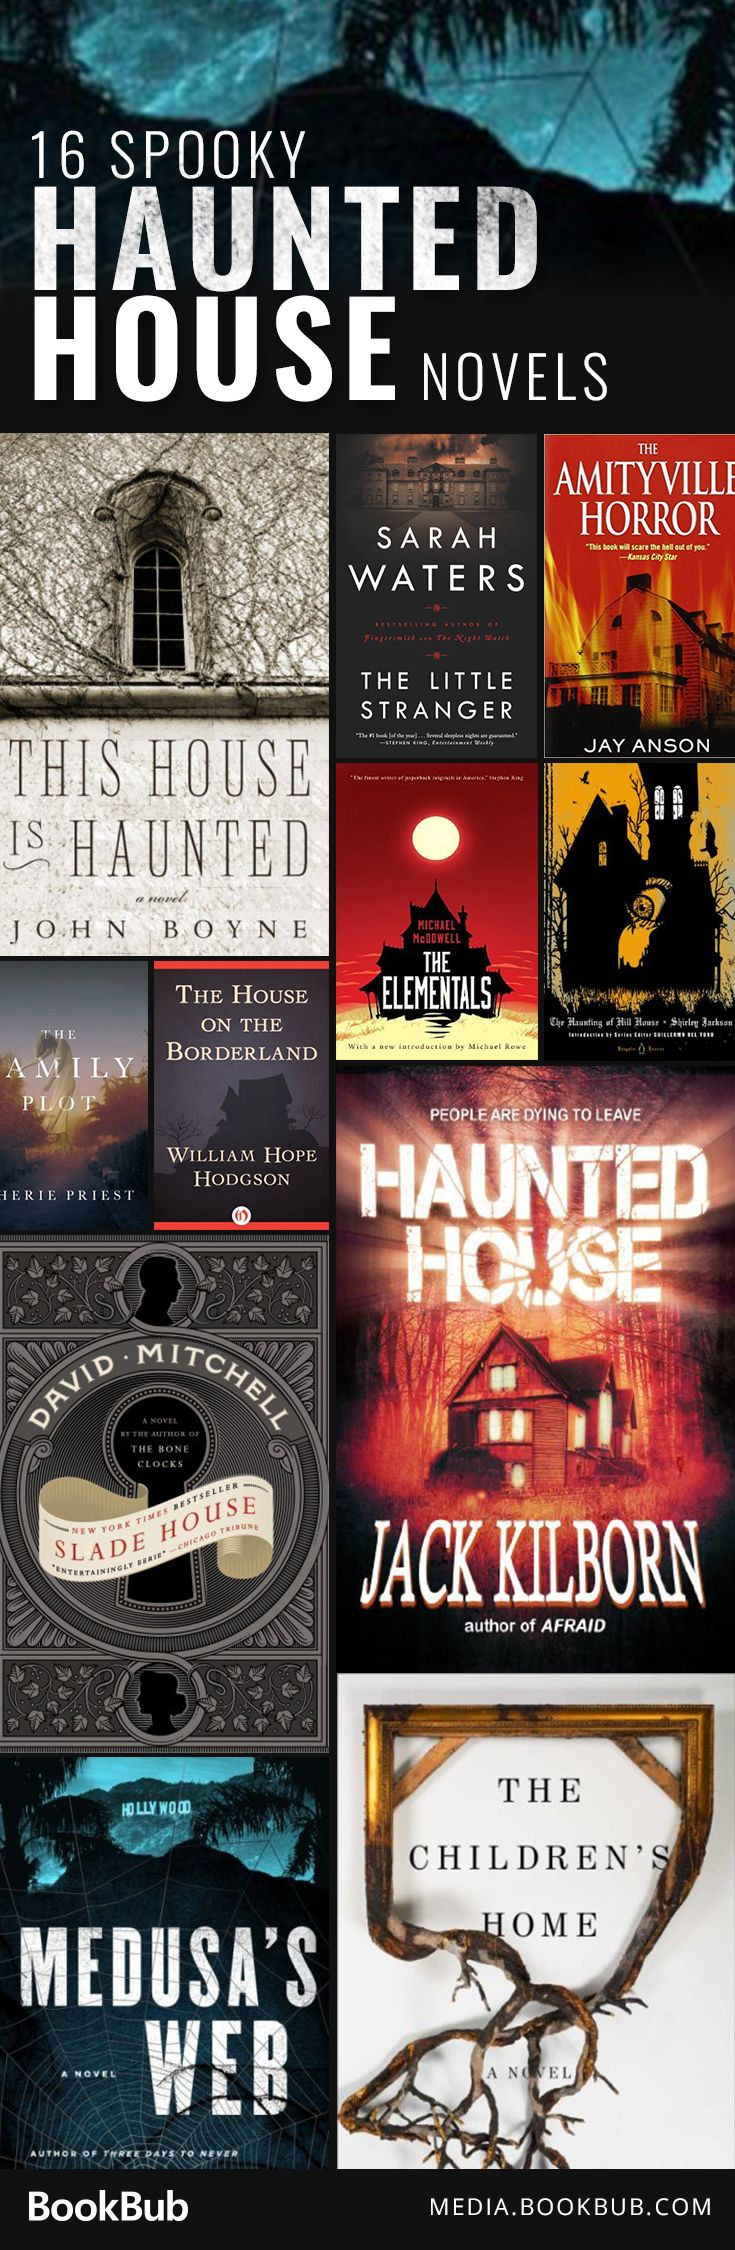 16 Haunted House Novels Guaranteed To Keep You Up All Night